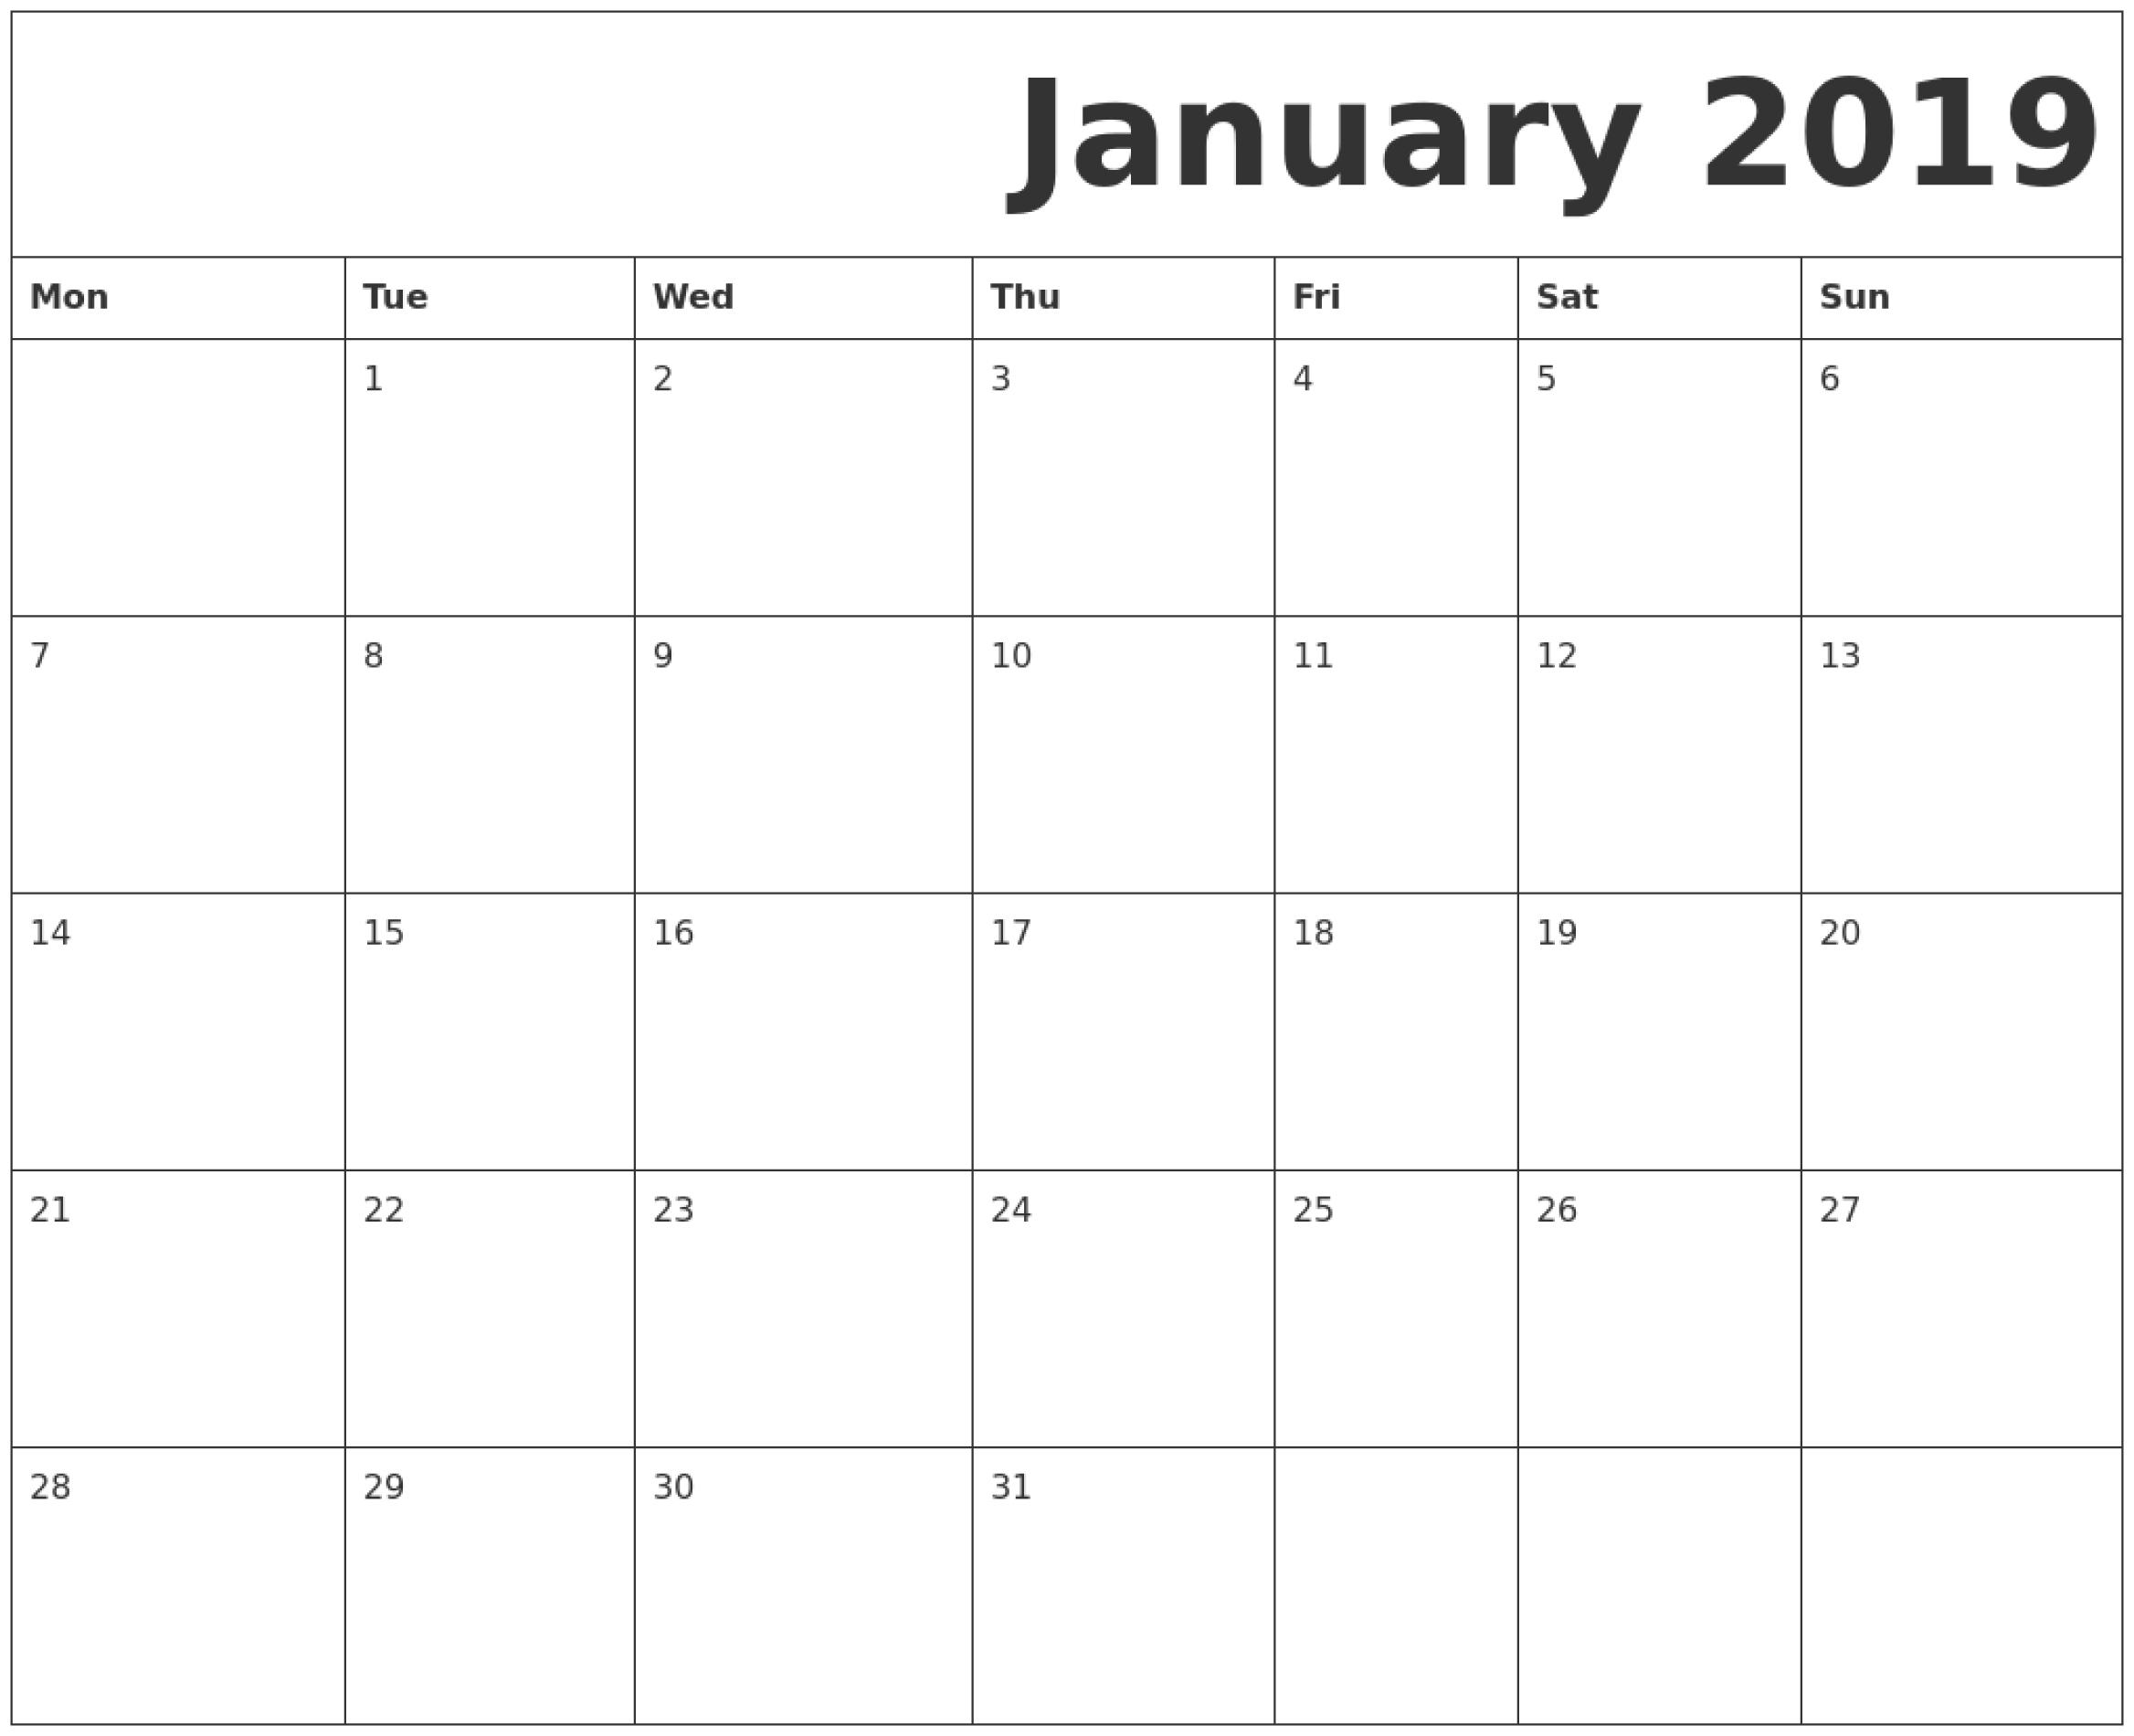 January 2019 Printable Calendar Monday Start. | Printable-Blank Calander Print Out Starting Monday